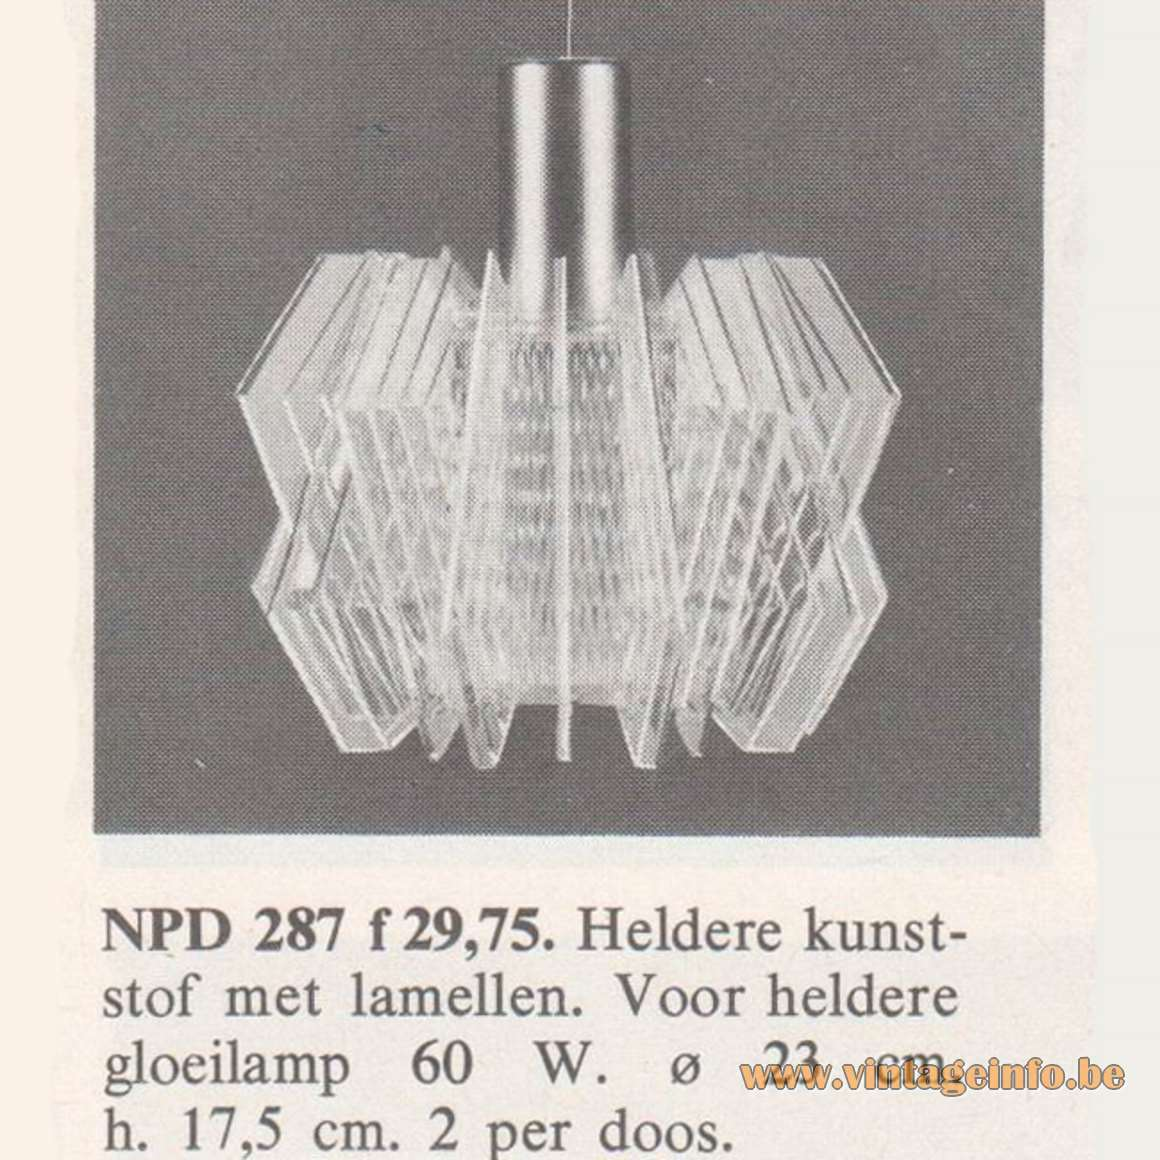 1968 Philips Slats Pendant Lamp NPD 287